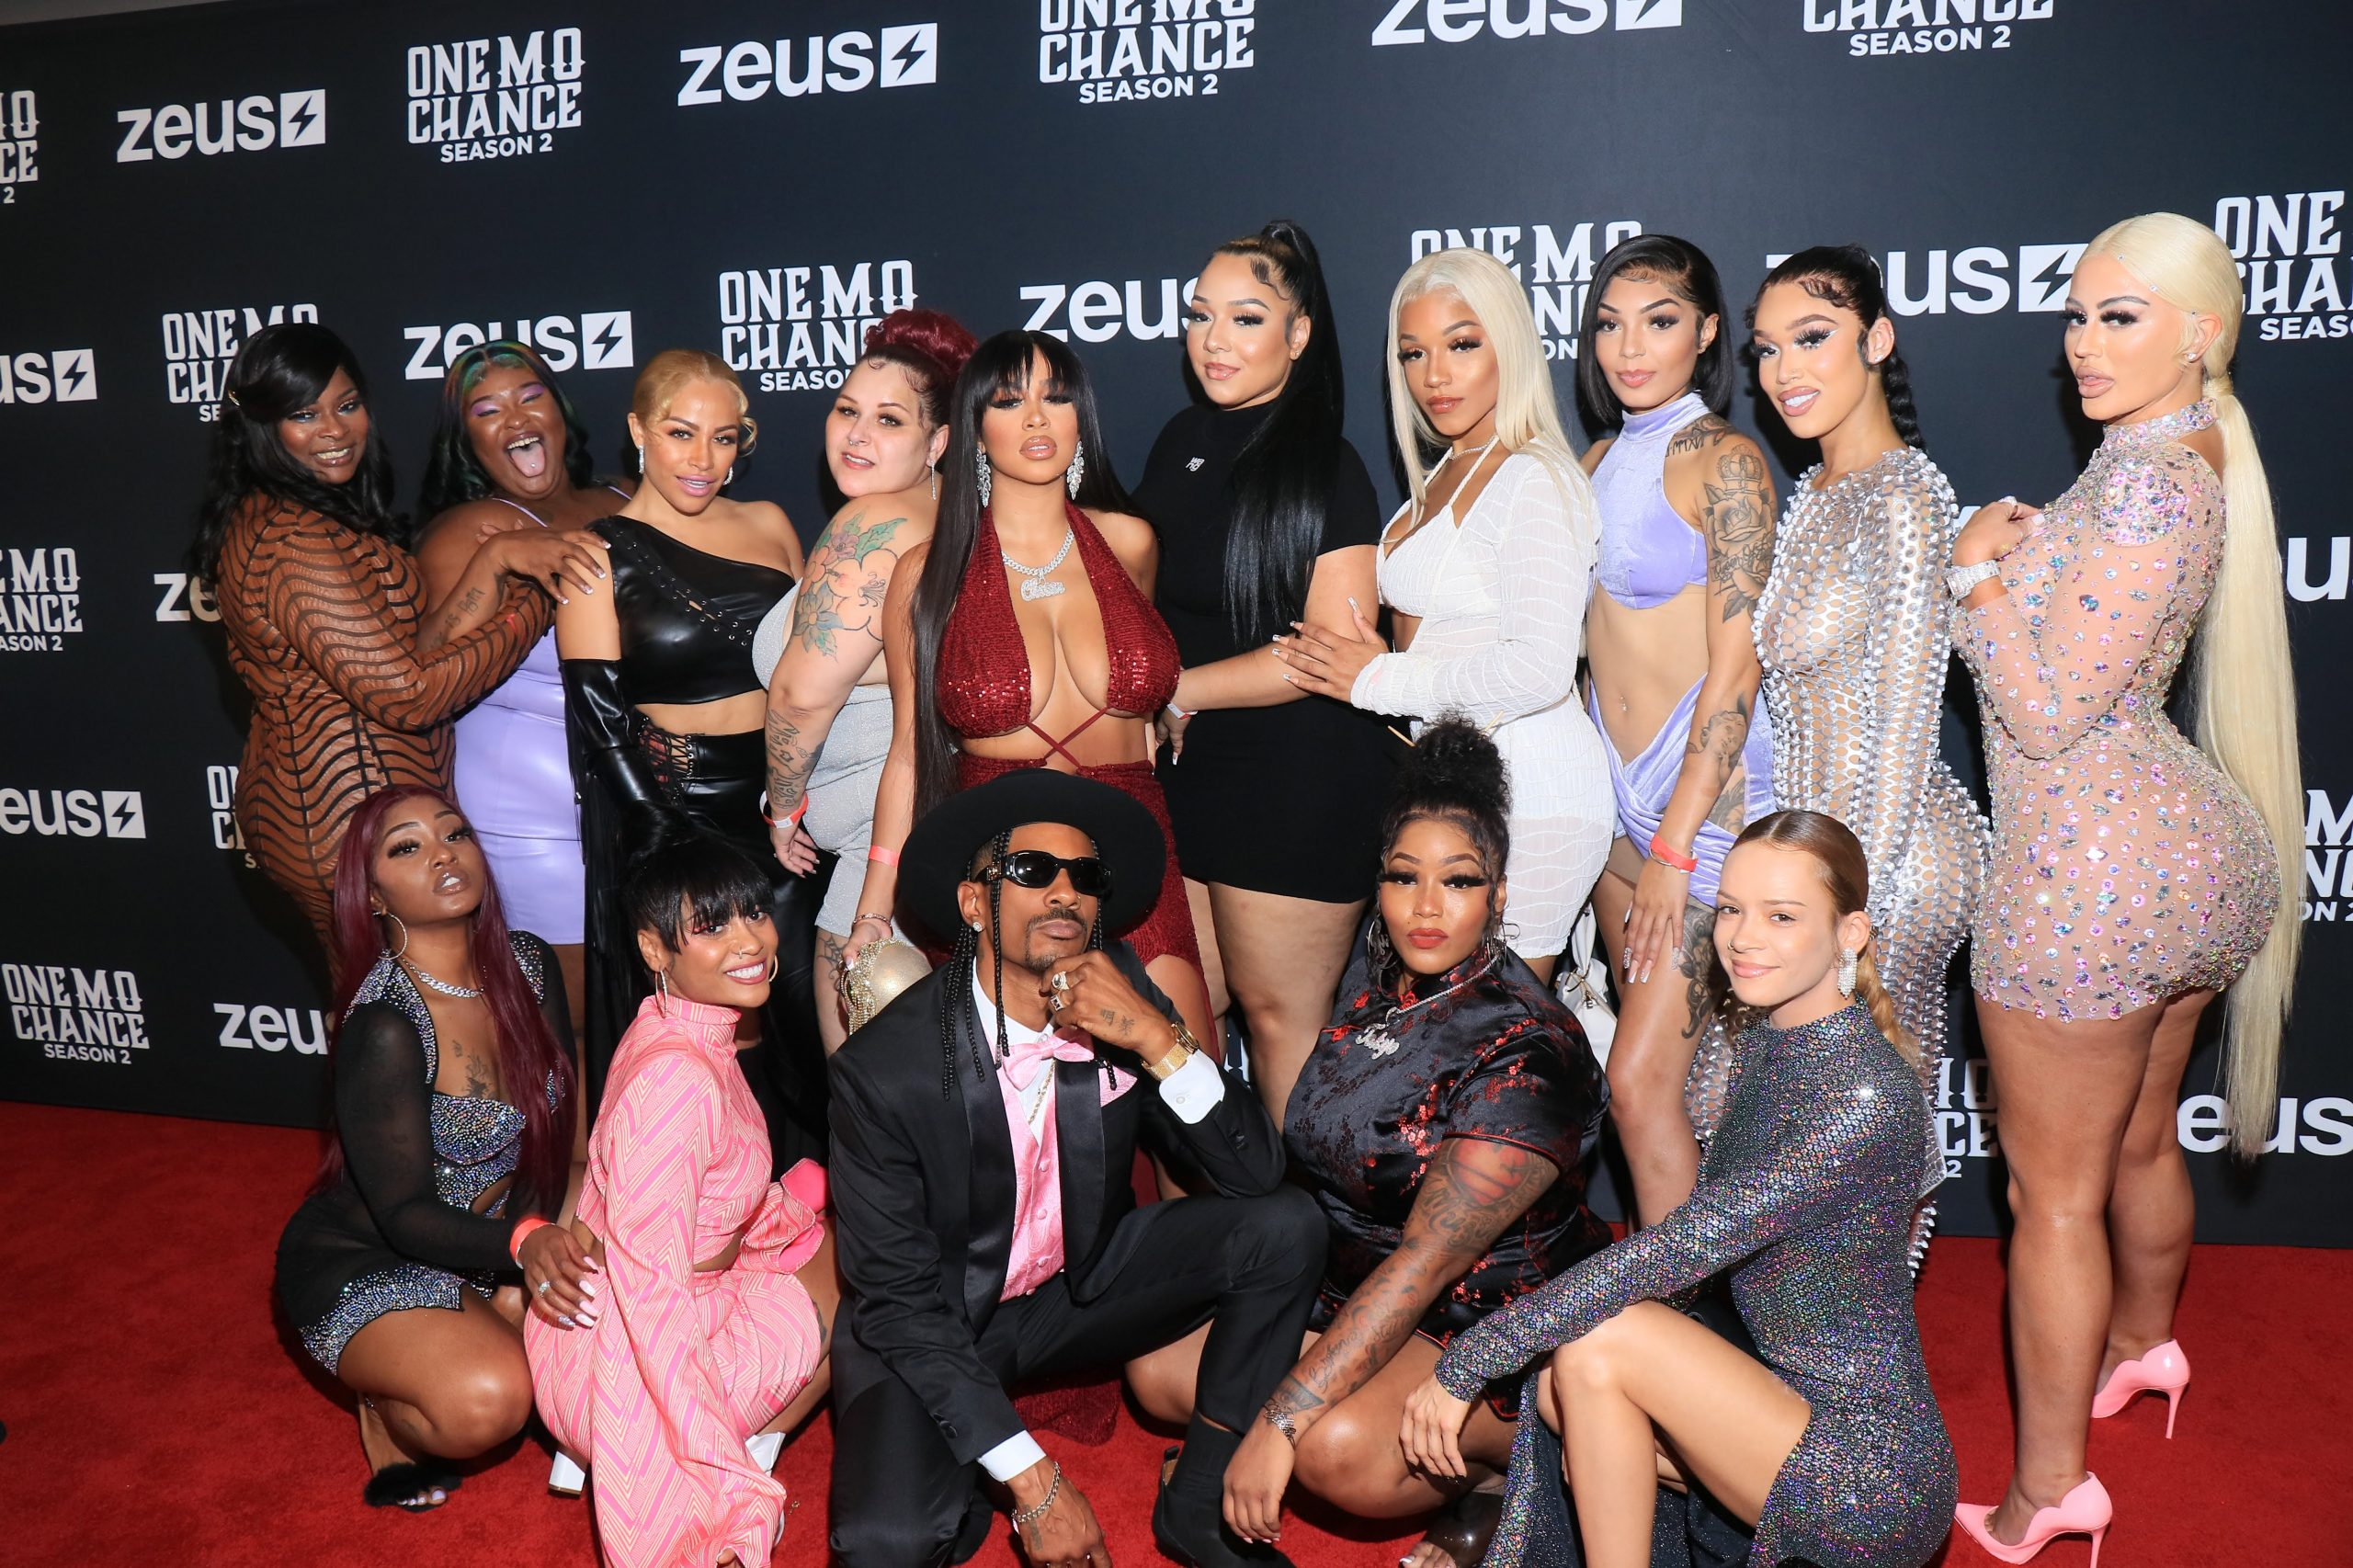 Red Carpet Pics: One Mo' Chance Season 2 Red Carpet Premiere